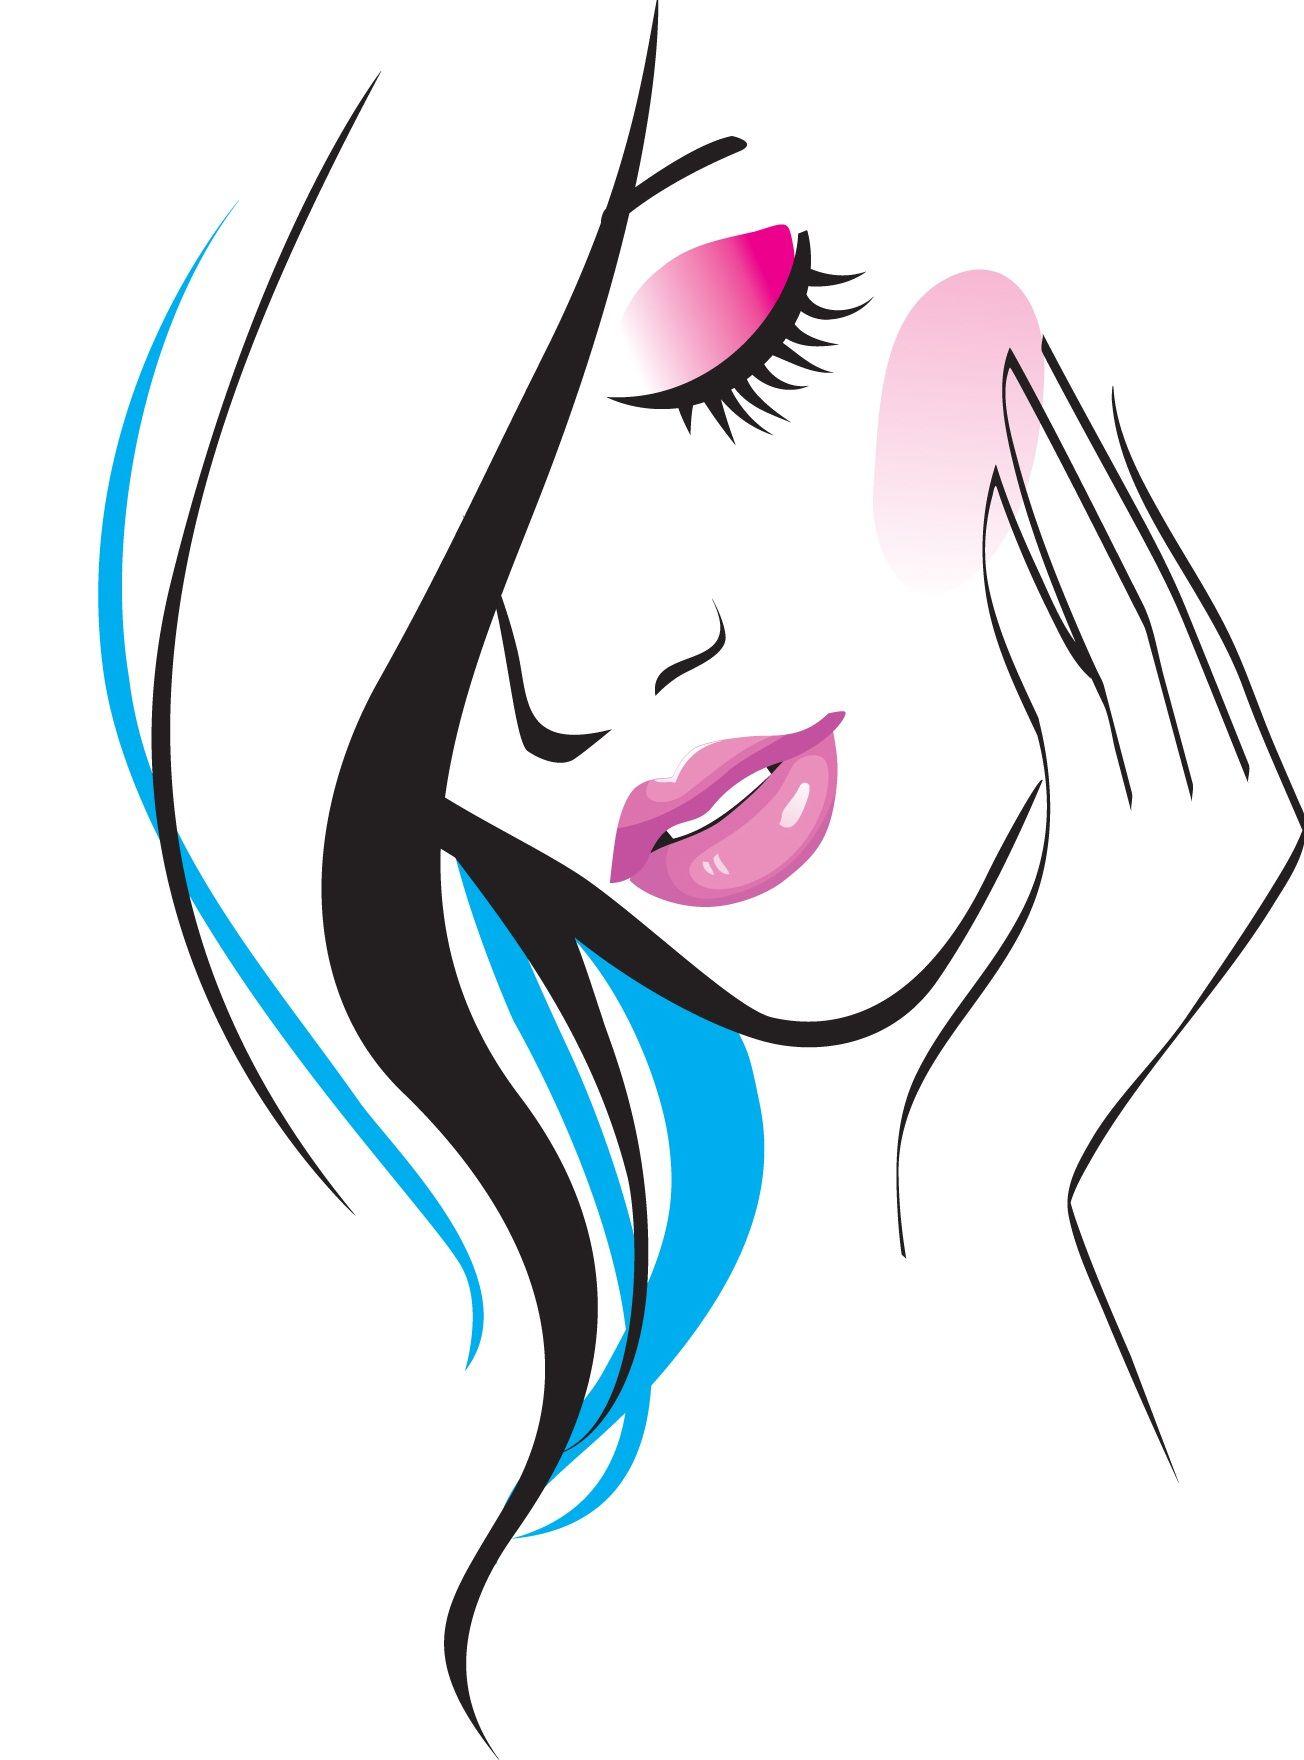 Pics for beauty parlor logo morgan joys vanity pinterest pics for beauty parlor logo altavistaventures Images